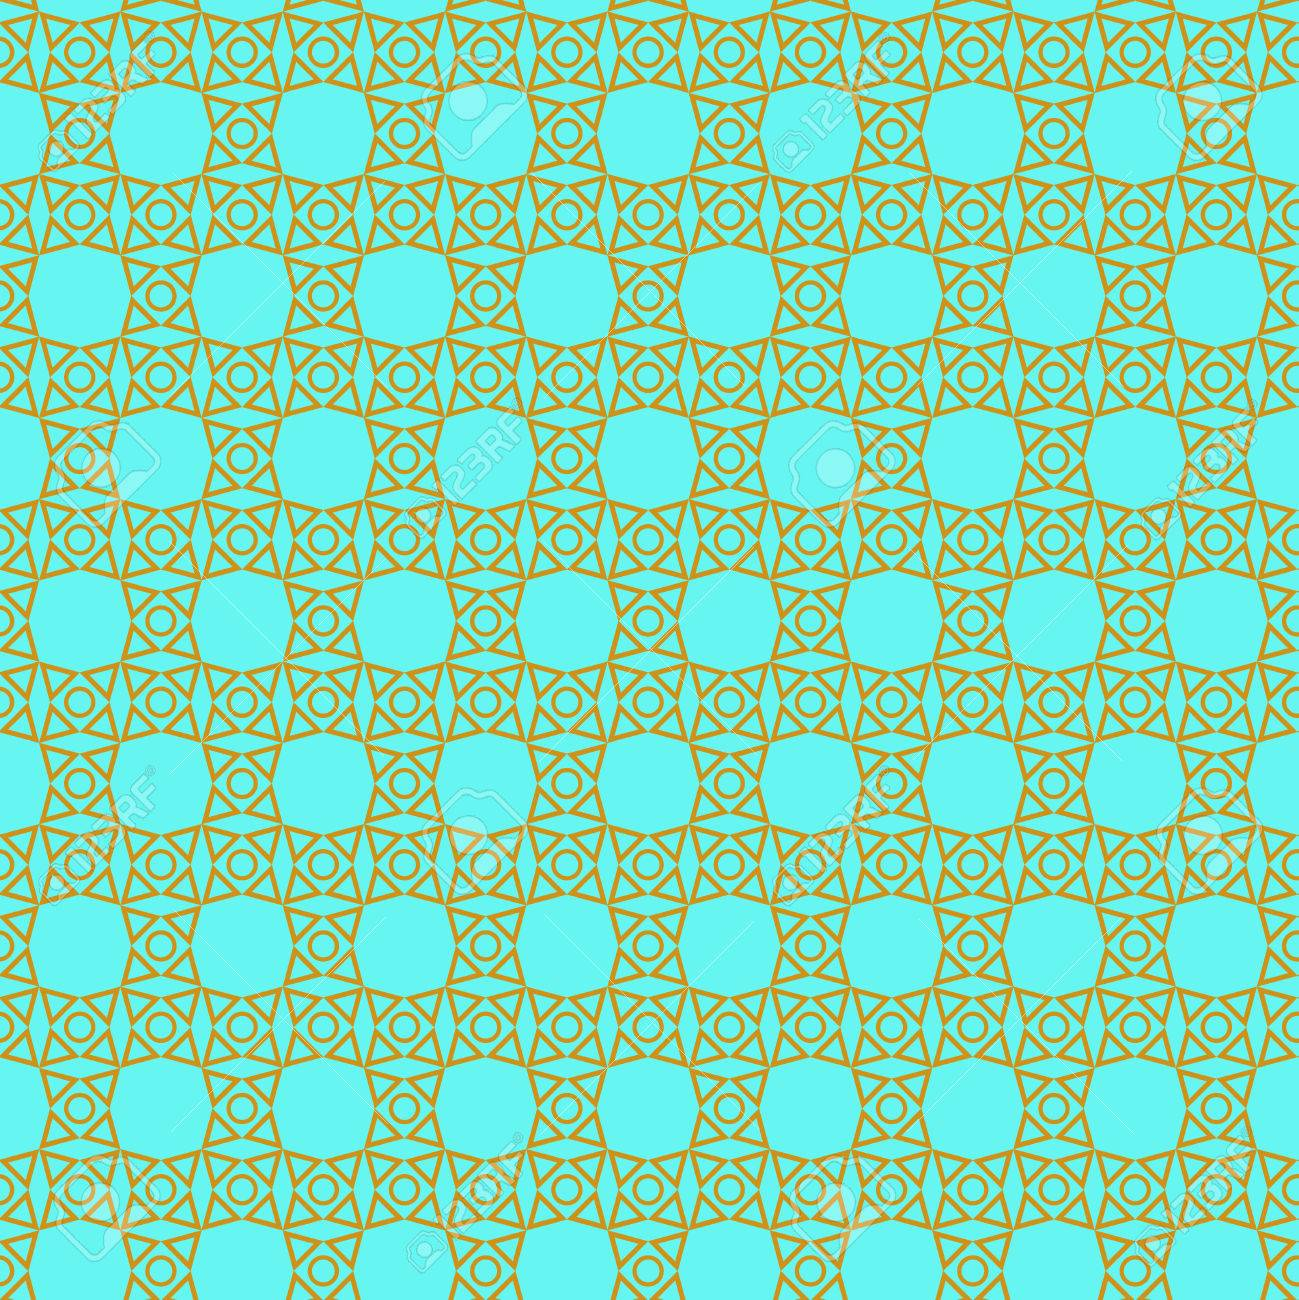 Seamless Pattern Geometric Texture Abstract Background Backdrop Mobile Smart Phone Tablet Desktop Wallpaper